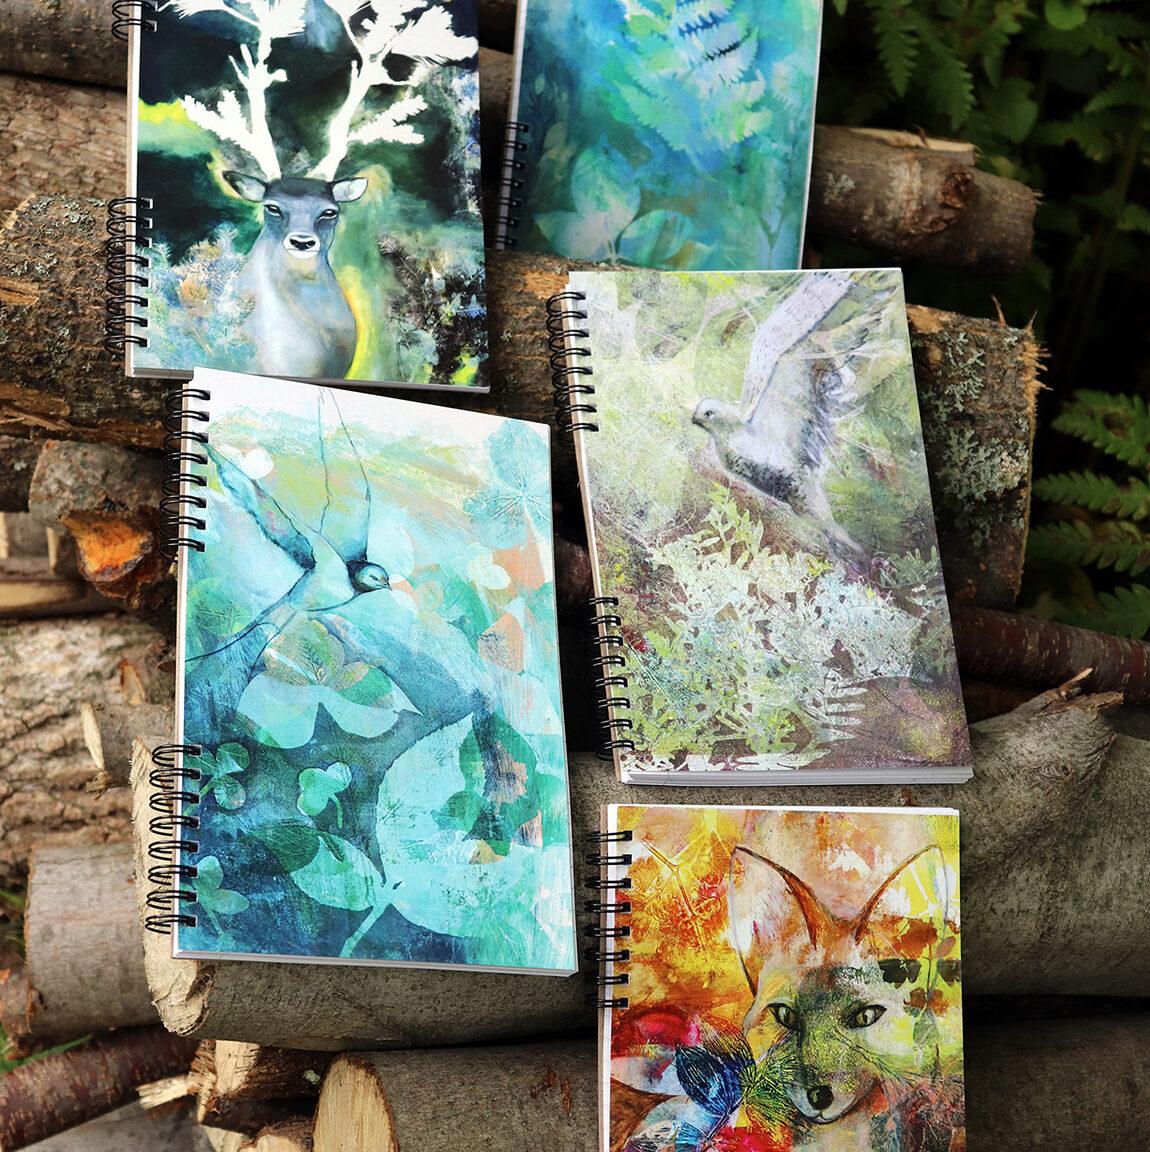 carnets-de-notes-etsy-artiste-peintre-carine-genadry-art-quebec